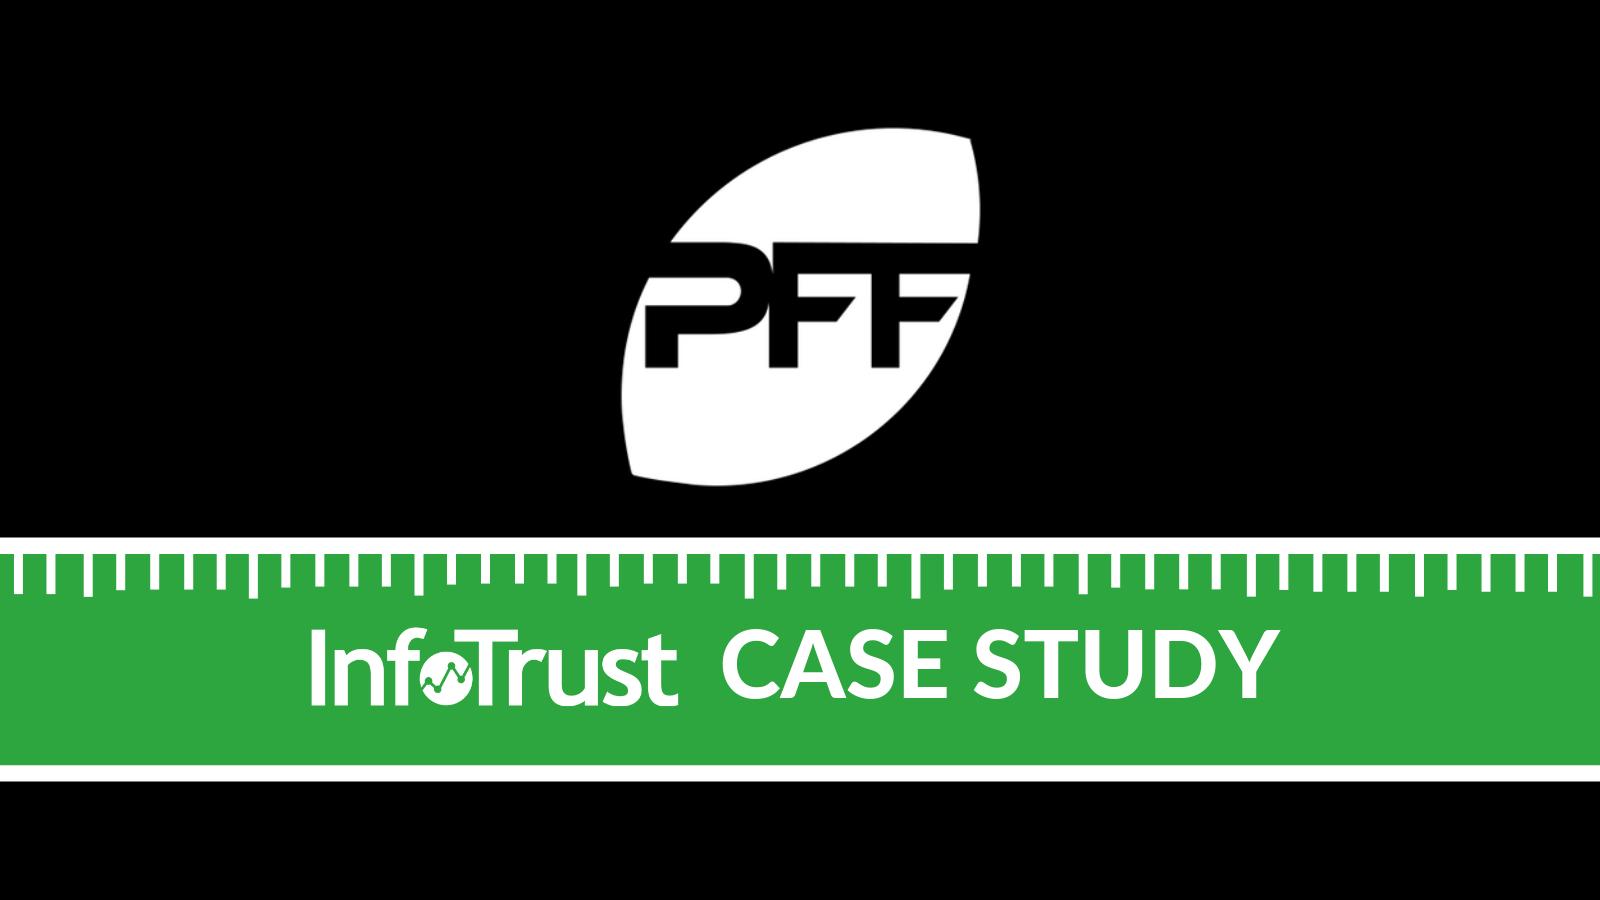 Pro Football Focus Case Study: Ensuring Analytics Accuracy Through Domain Migration